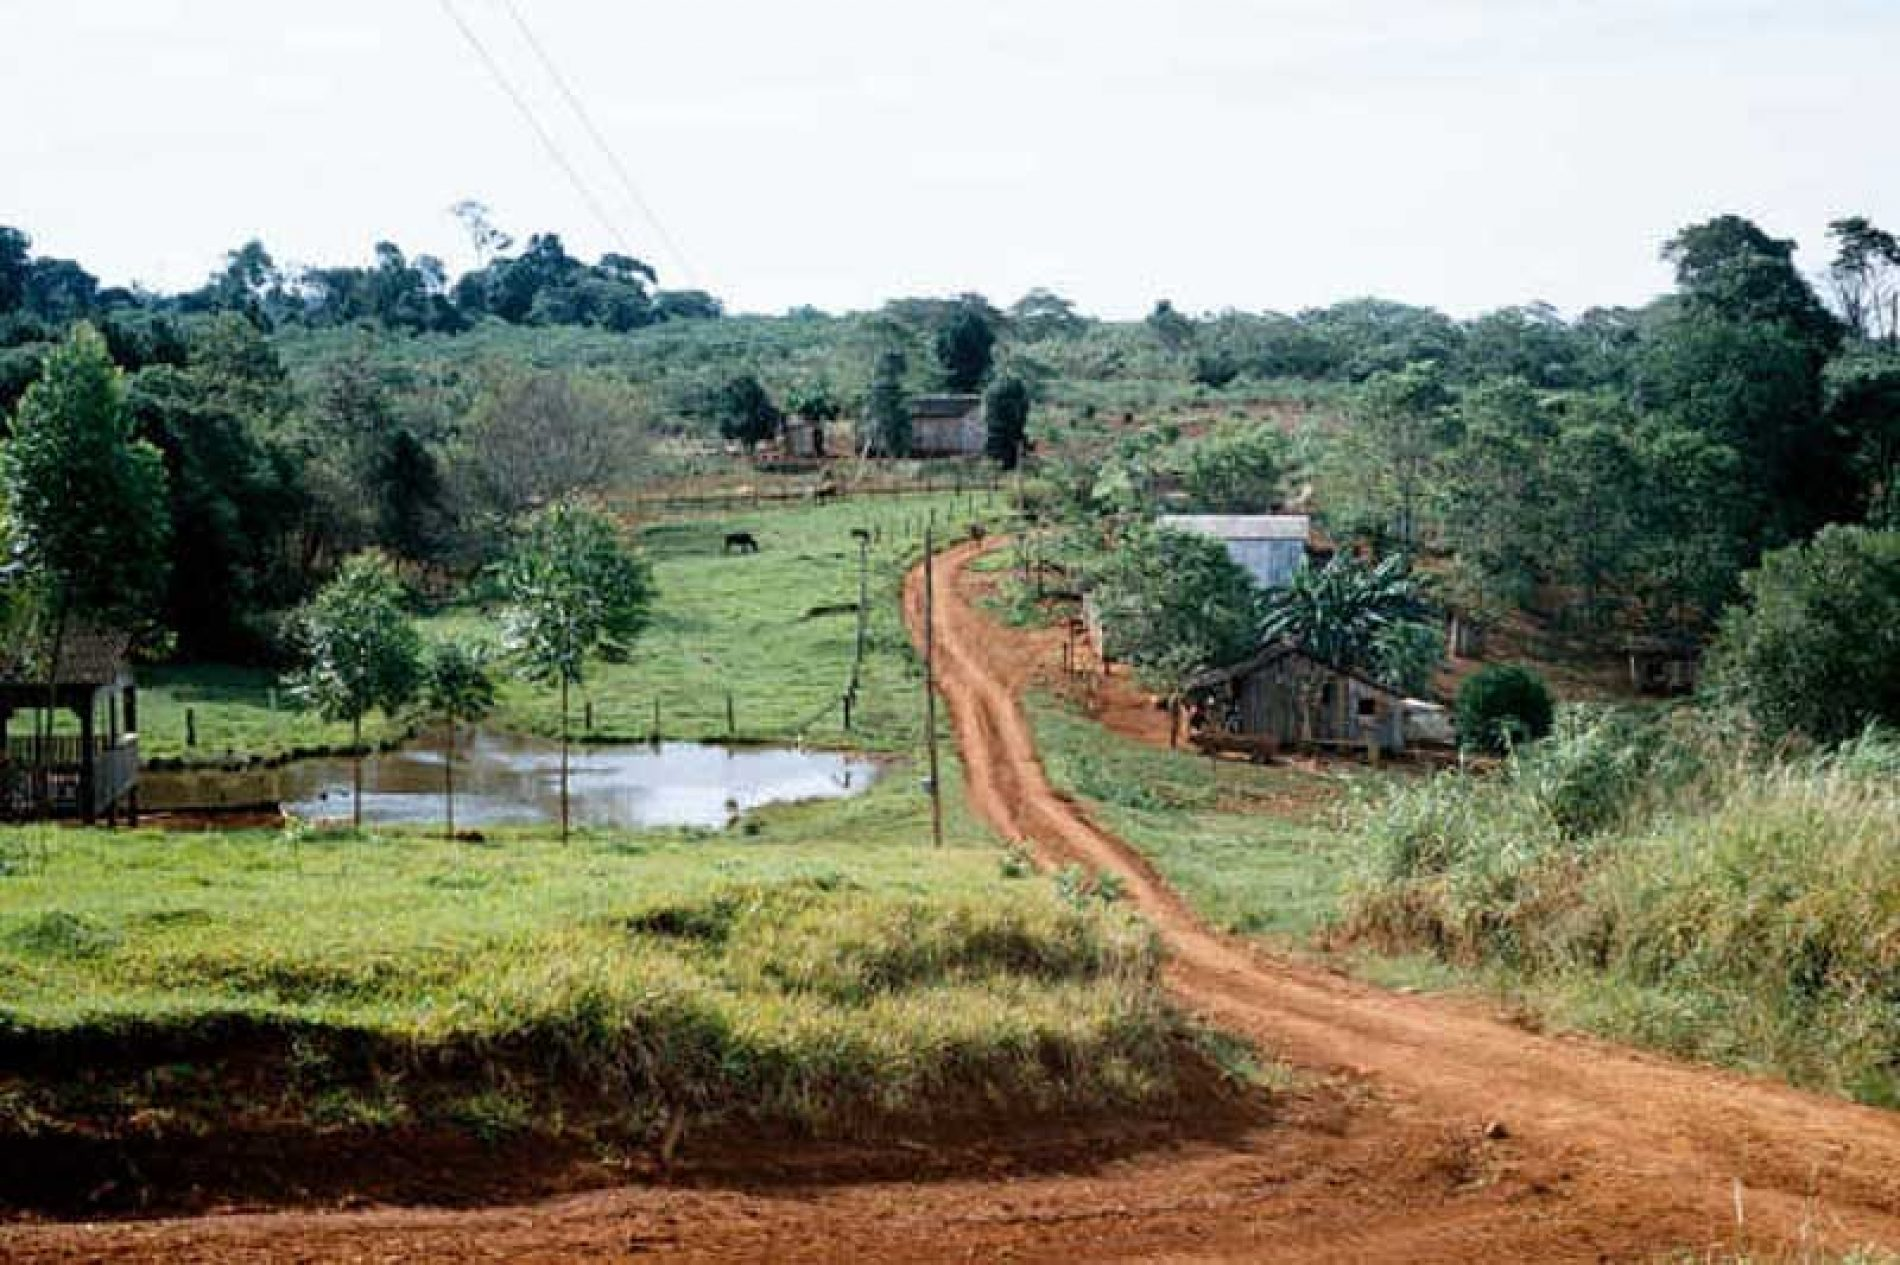 Caminos privados inscritos como públicos